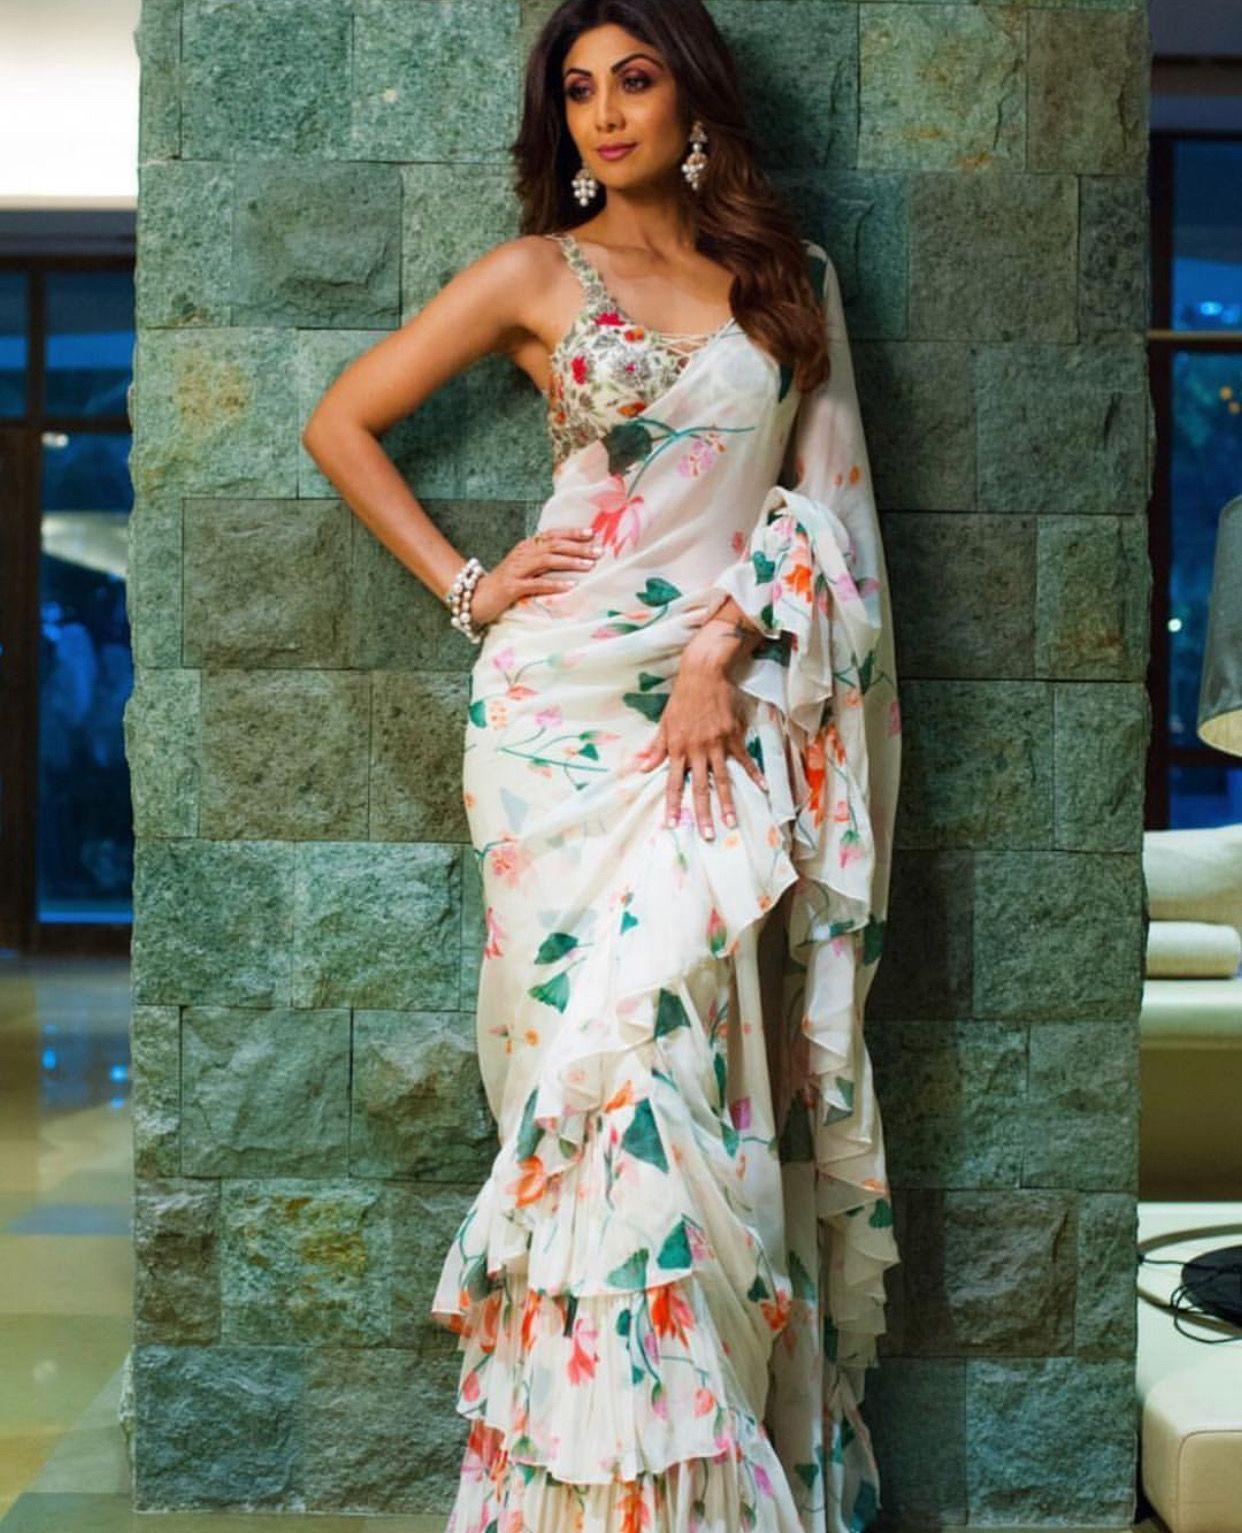 33200e36b32e95 Oh my, prettiness | Beau | Modern saree, Blouse designs, Saree